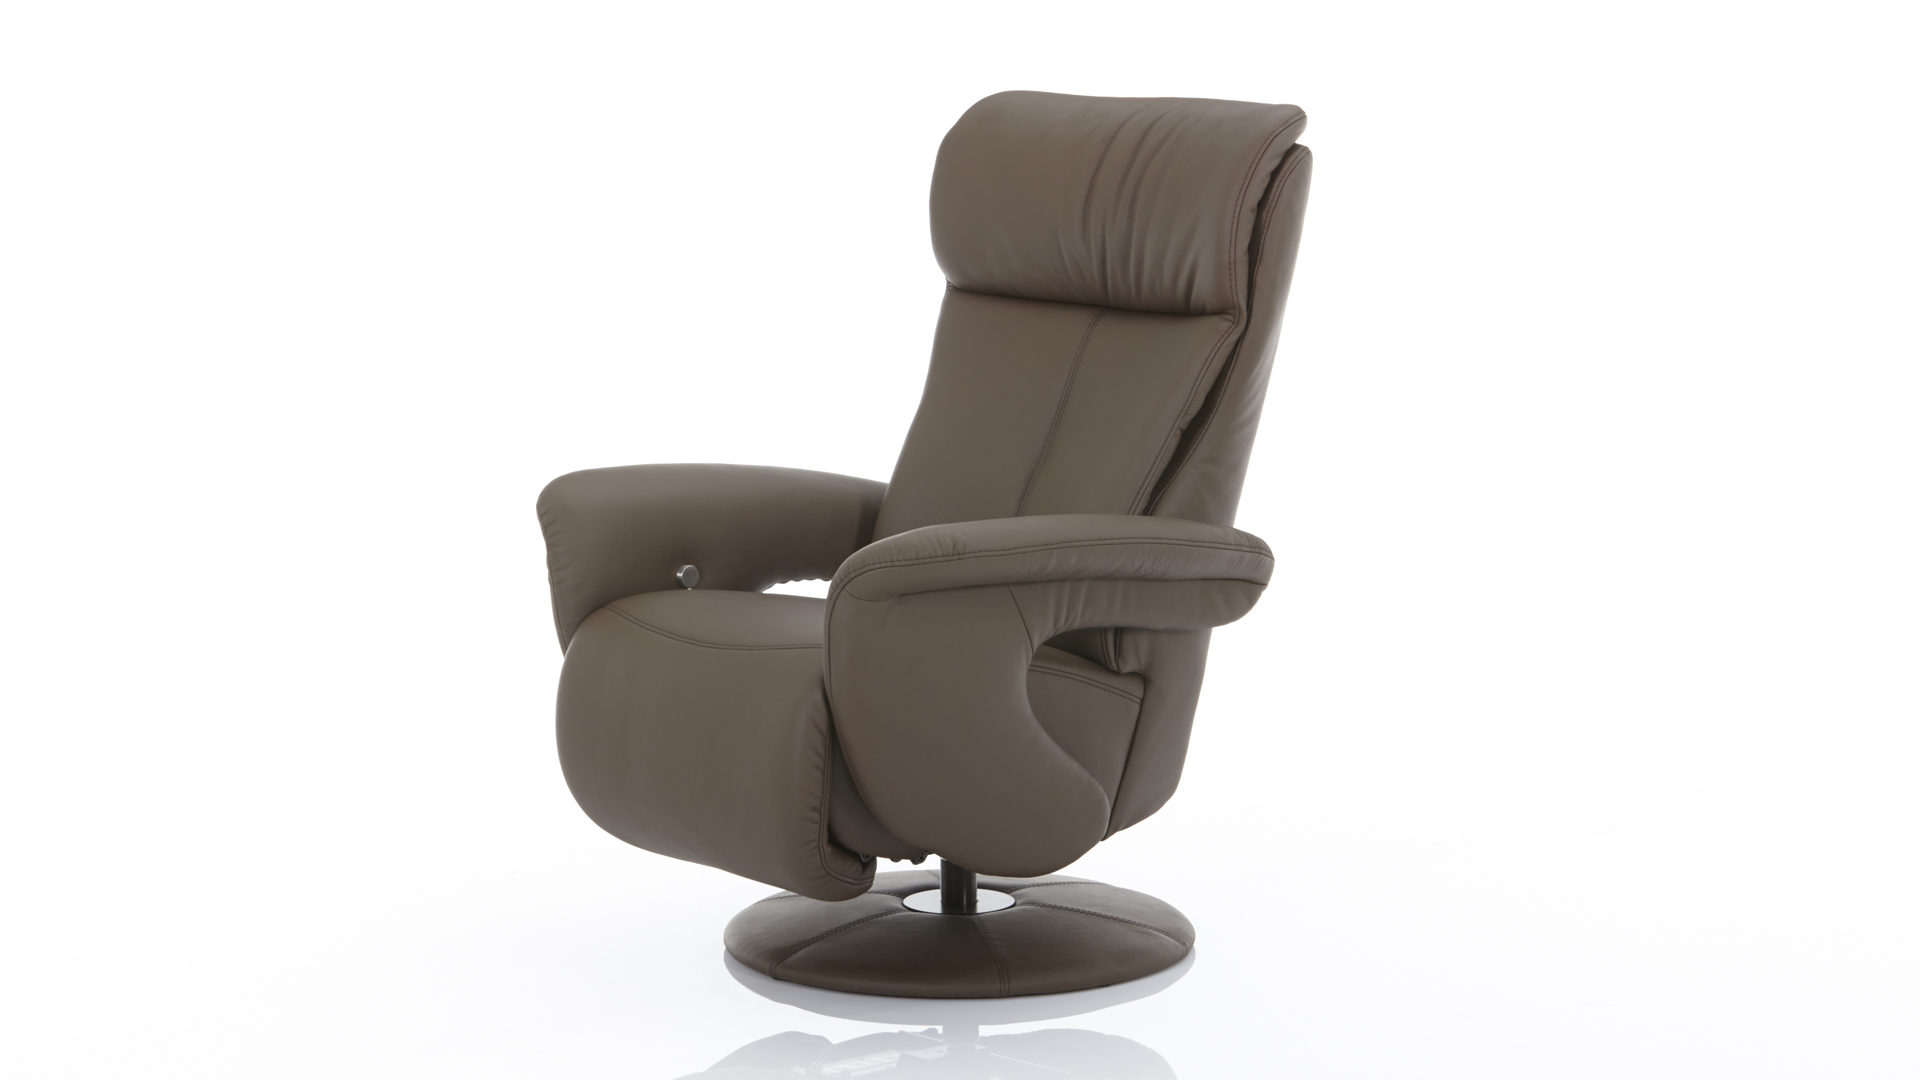 Comfortmaster Easy Swing Sessel 7333 Als Sitzmöbel Braunes Longlife